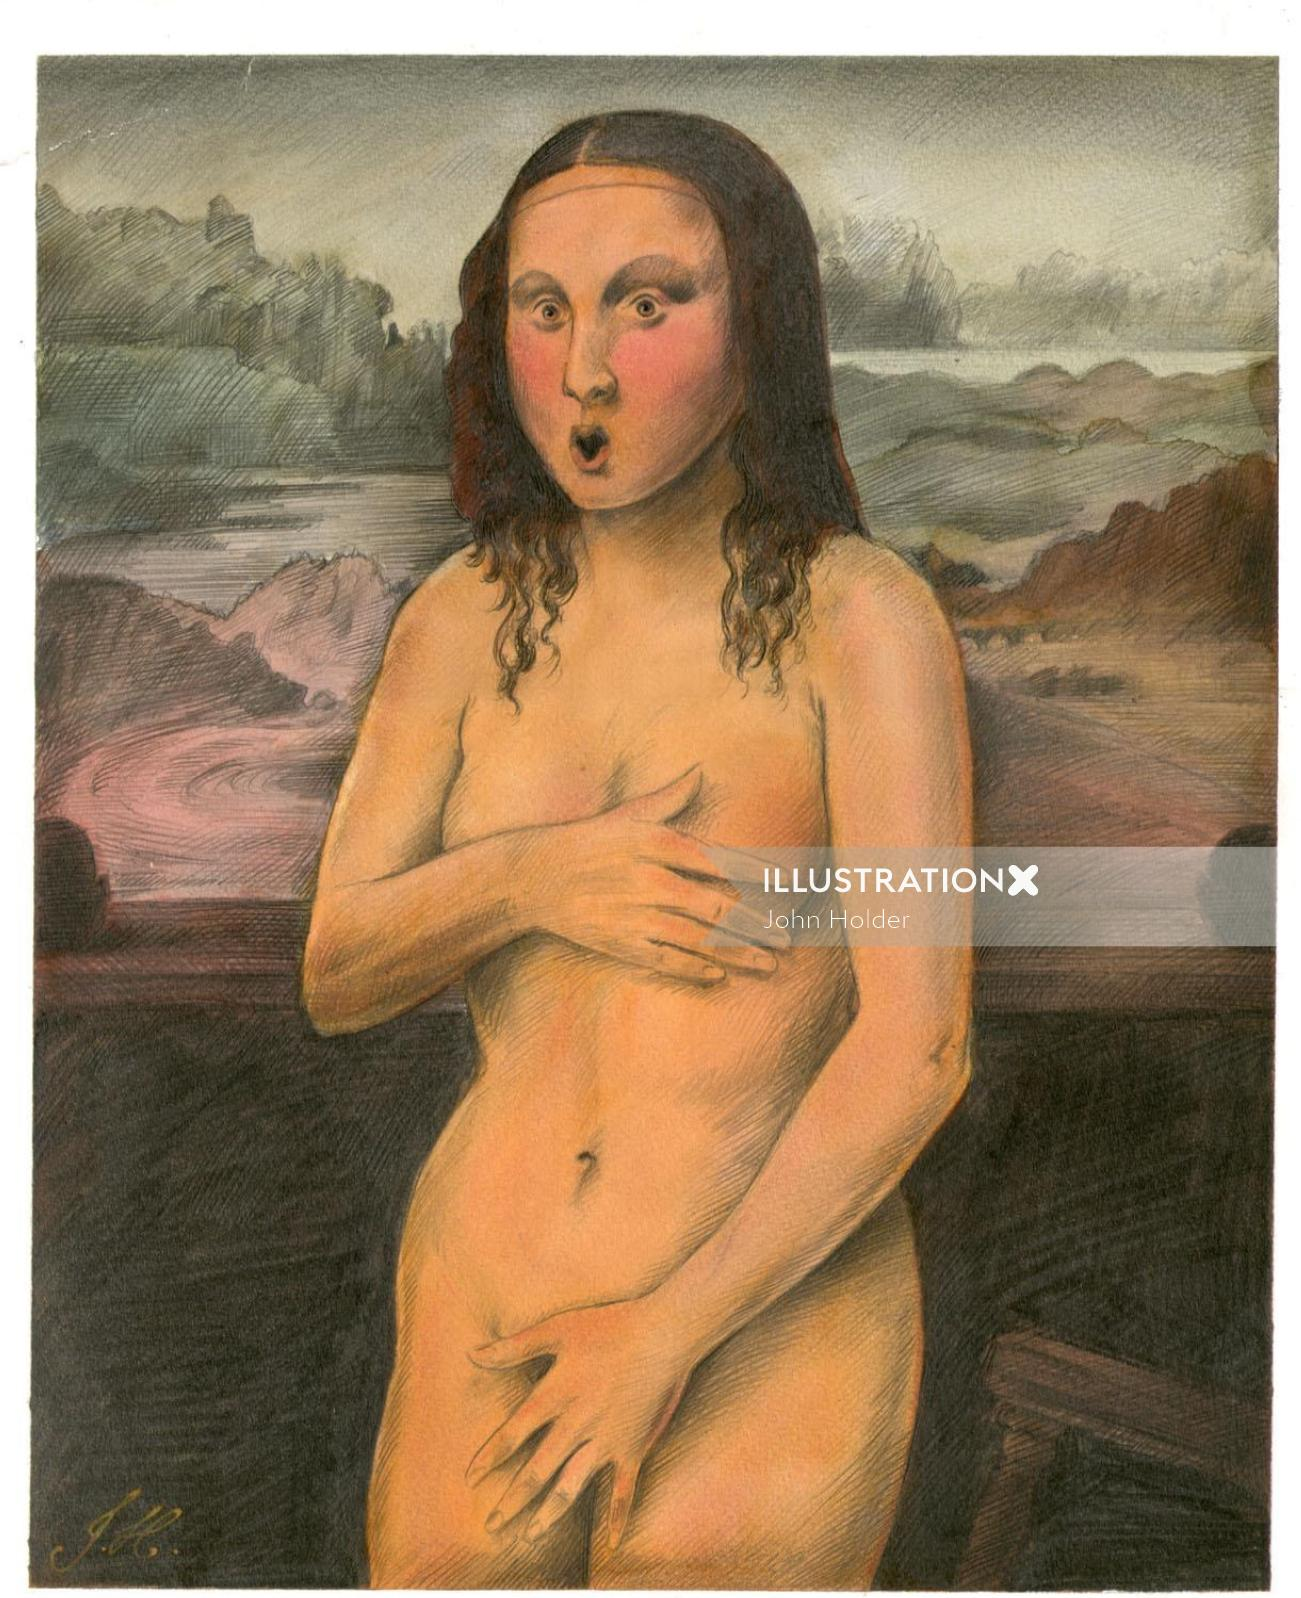 Humorous illustration of Monalisa